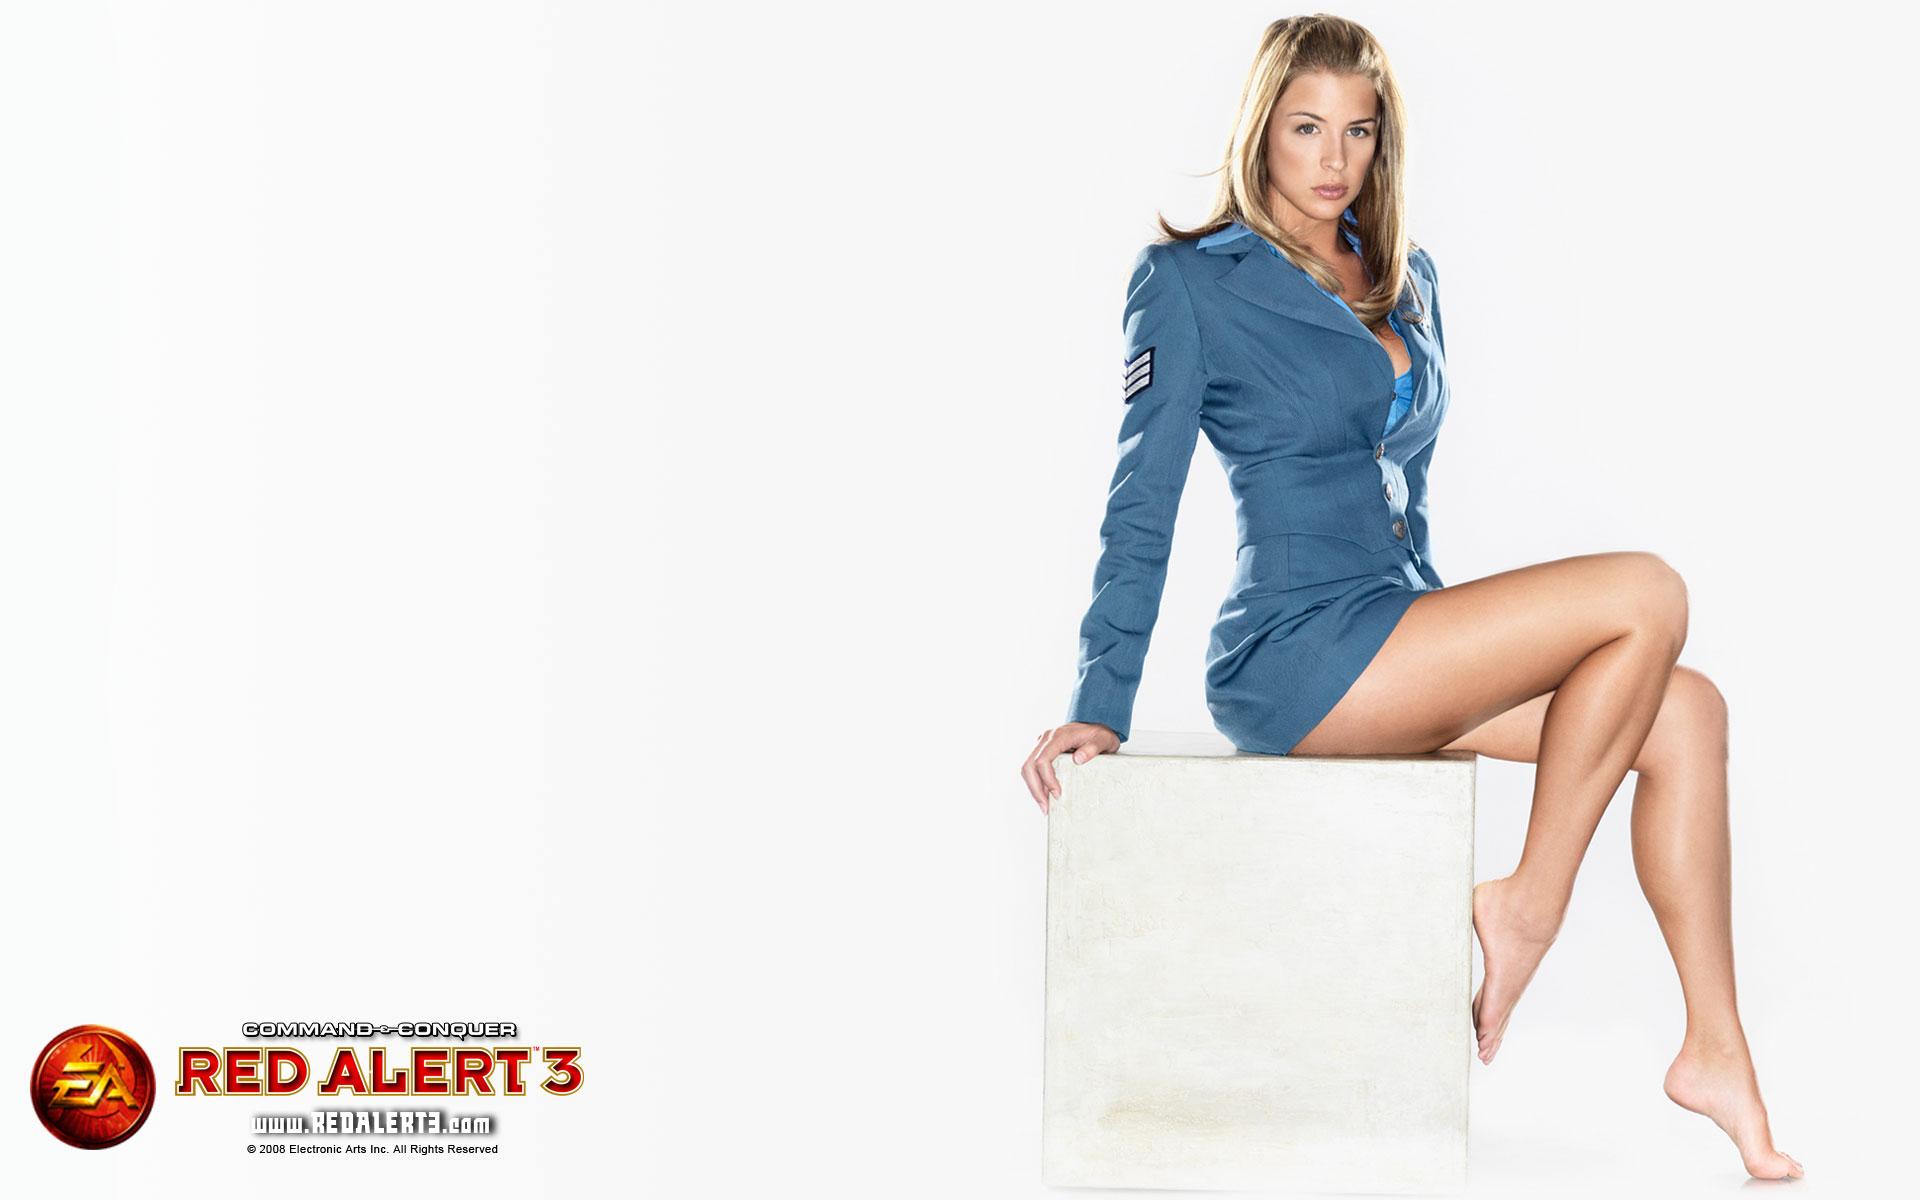 News Gemma Atkinson To Play Eva In Red Alert 3 Megagames